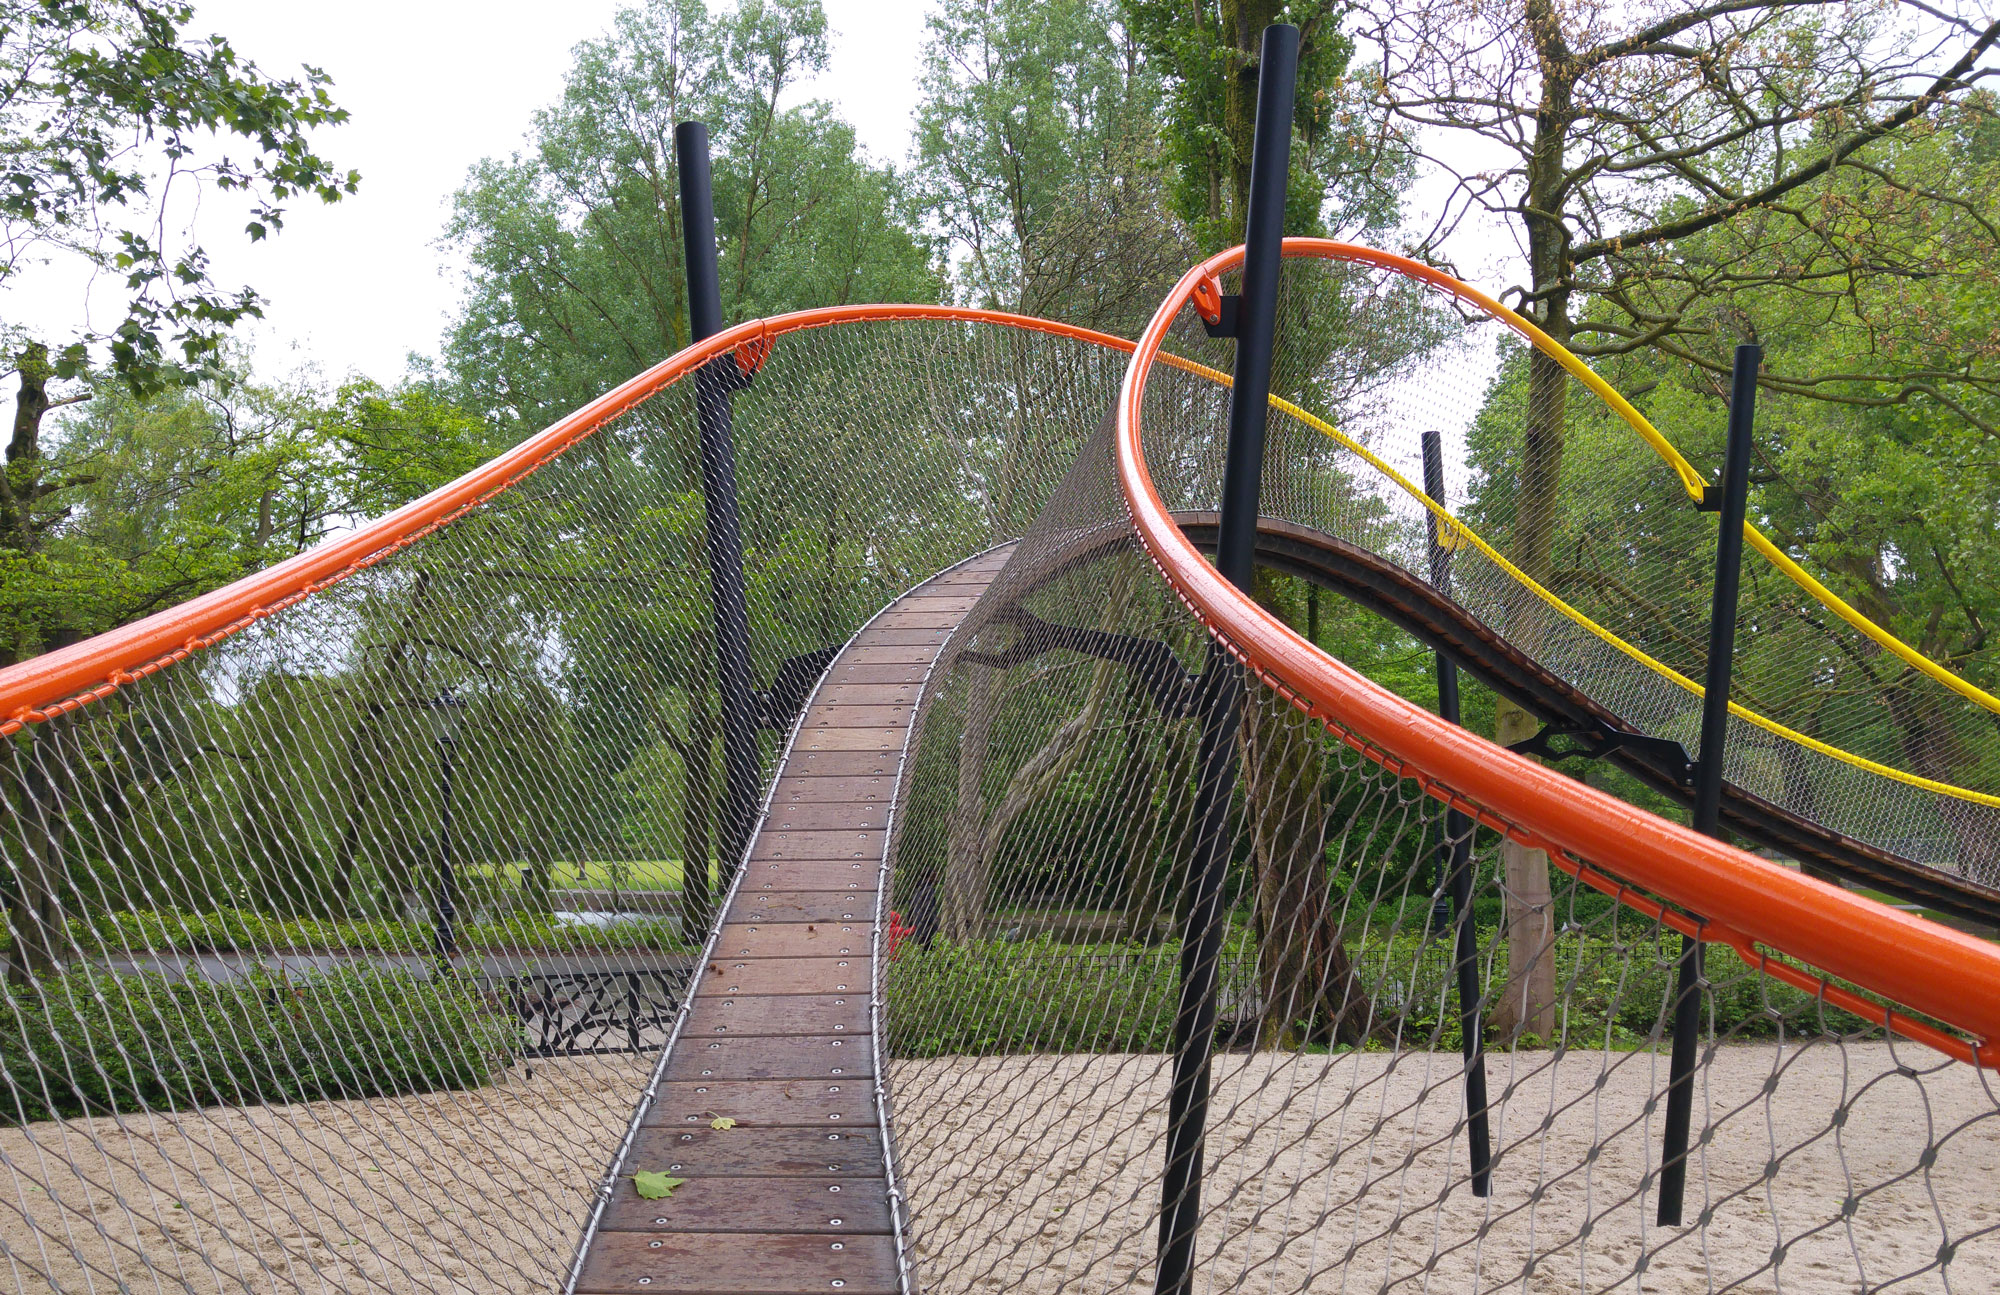 urbanbacklog-amsterdam-oosterpark-play-garland-7.jpg